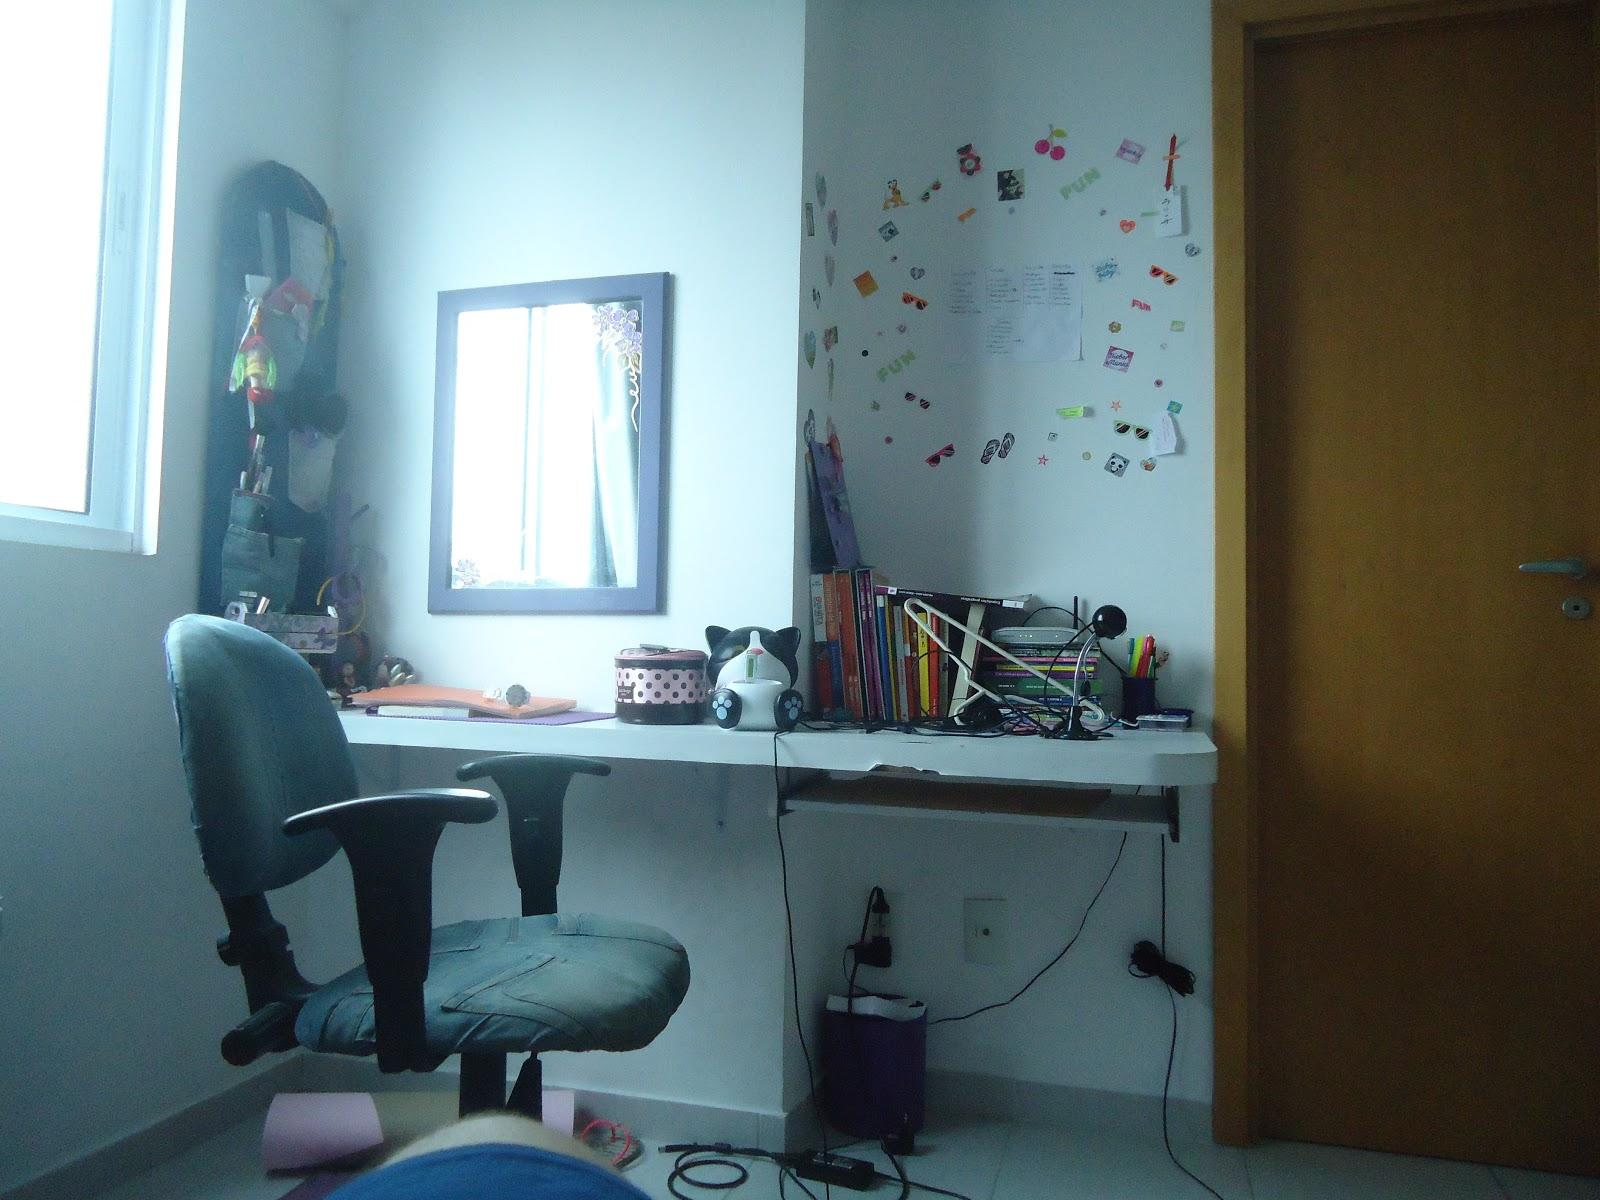 Lar de Arteira: Bancada de estudo e penteadeira #238DA8 1600x1200